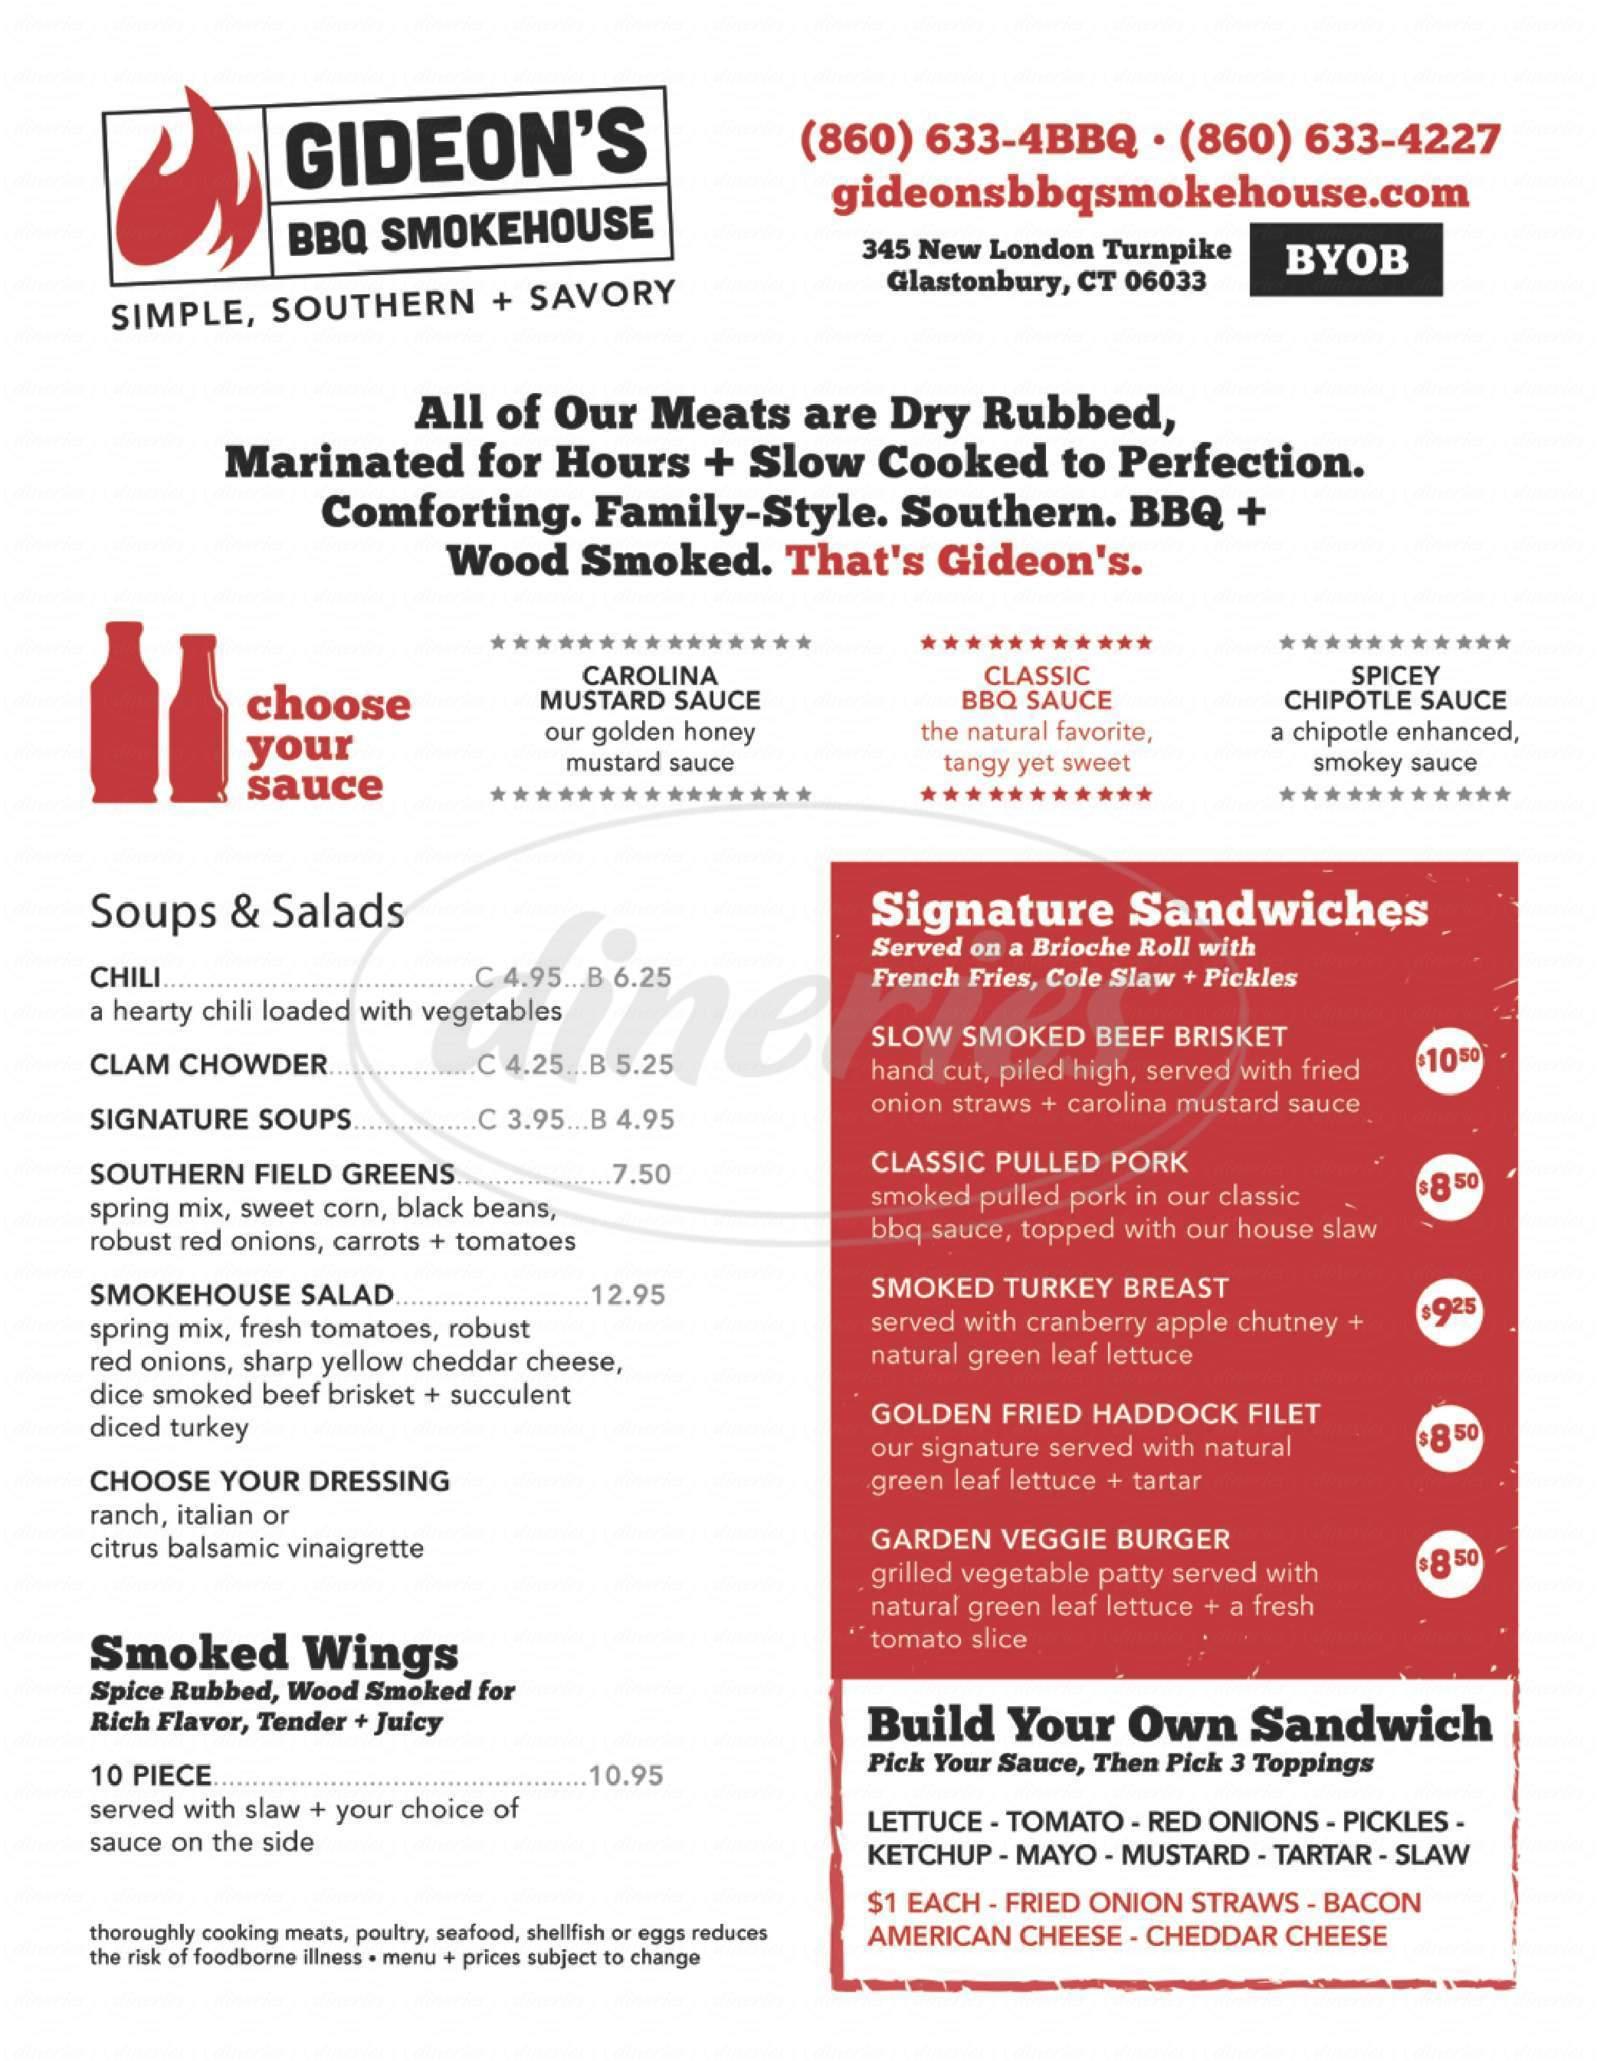 menu for Gideon's BBQ Smokehouse